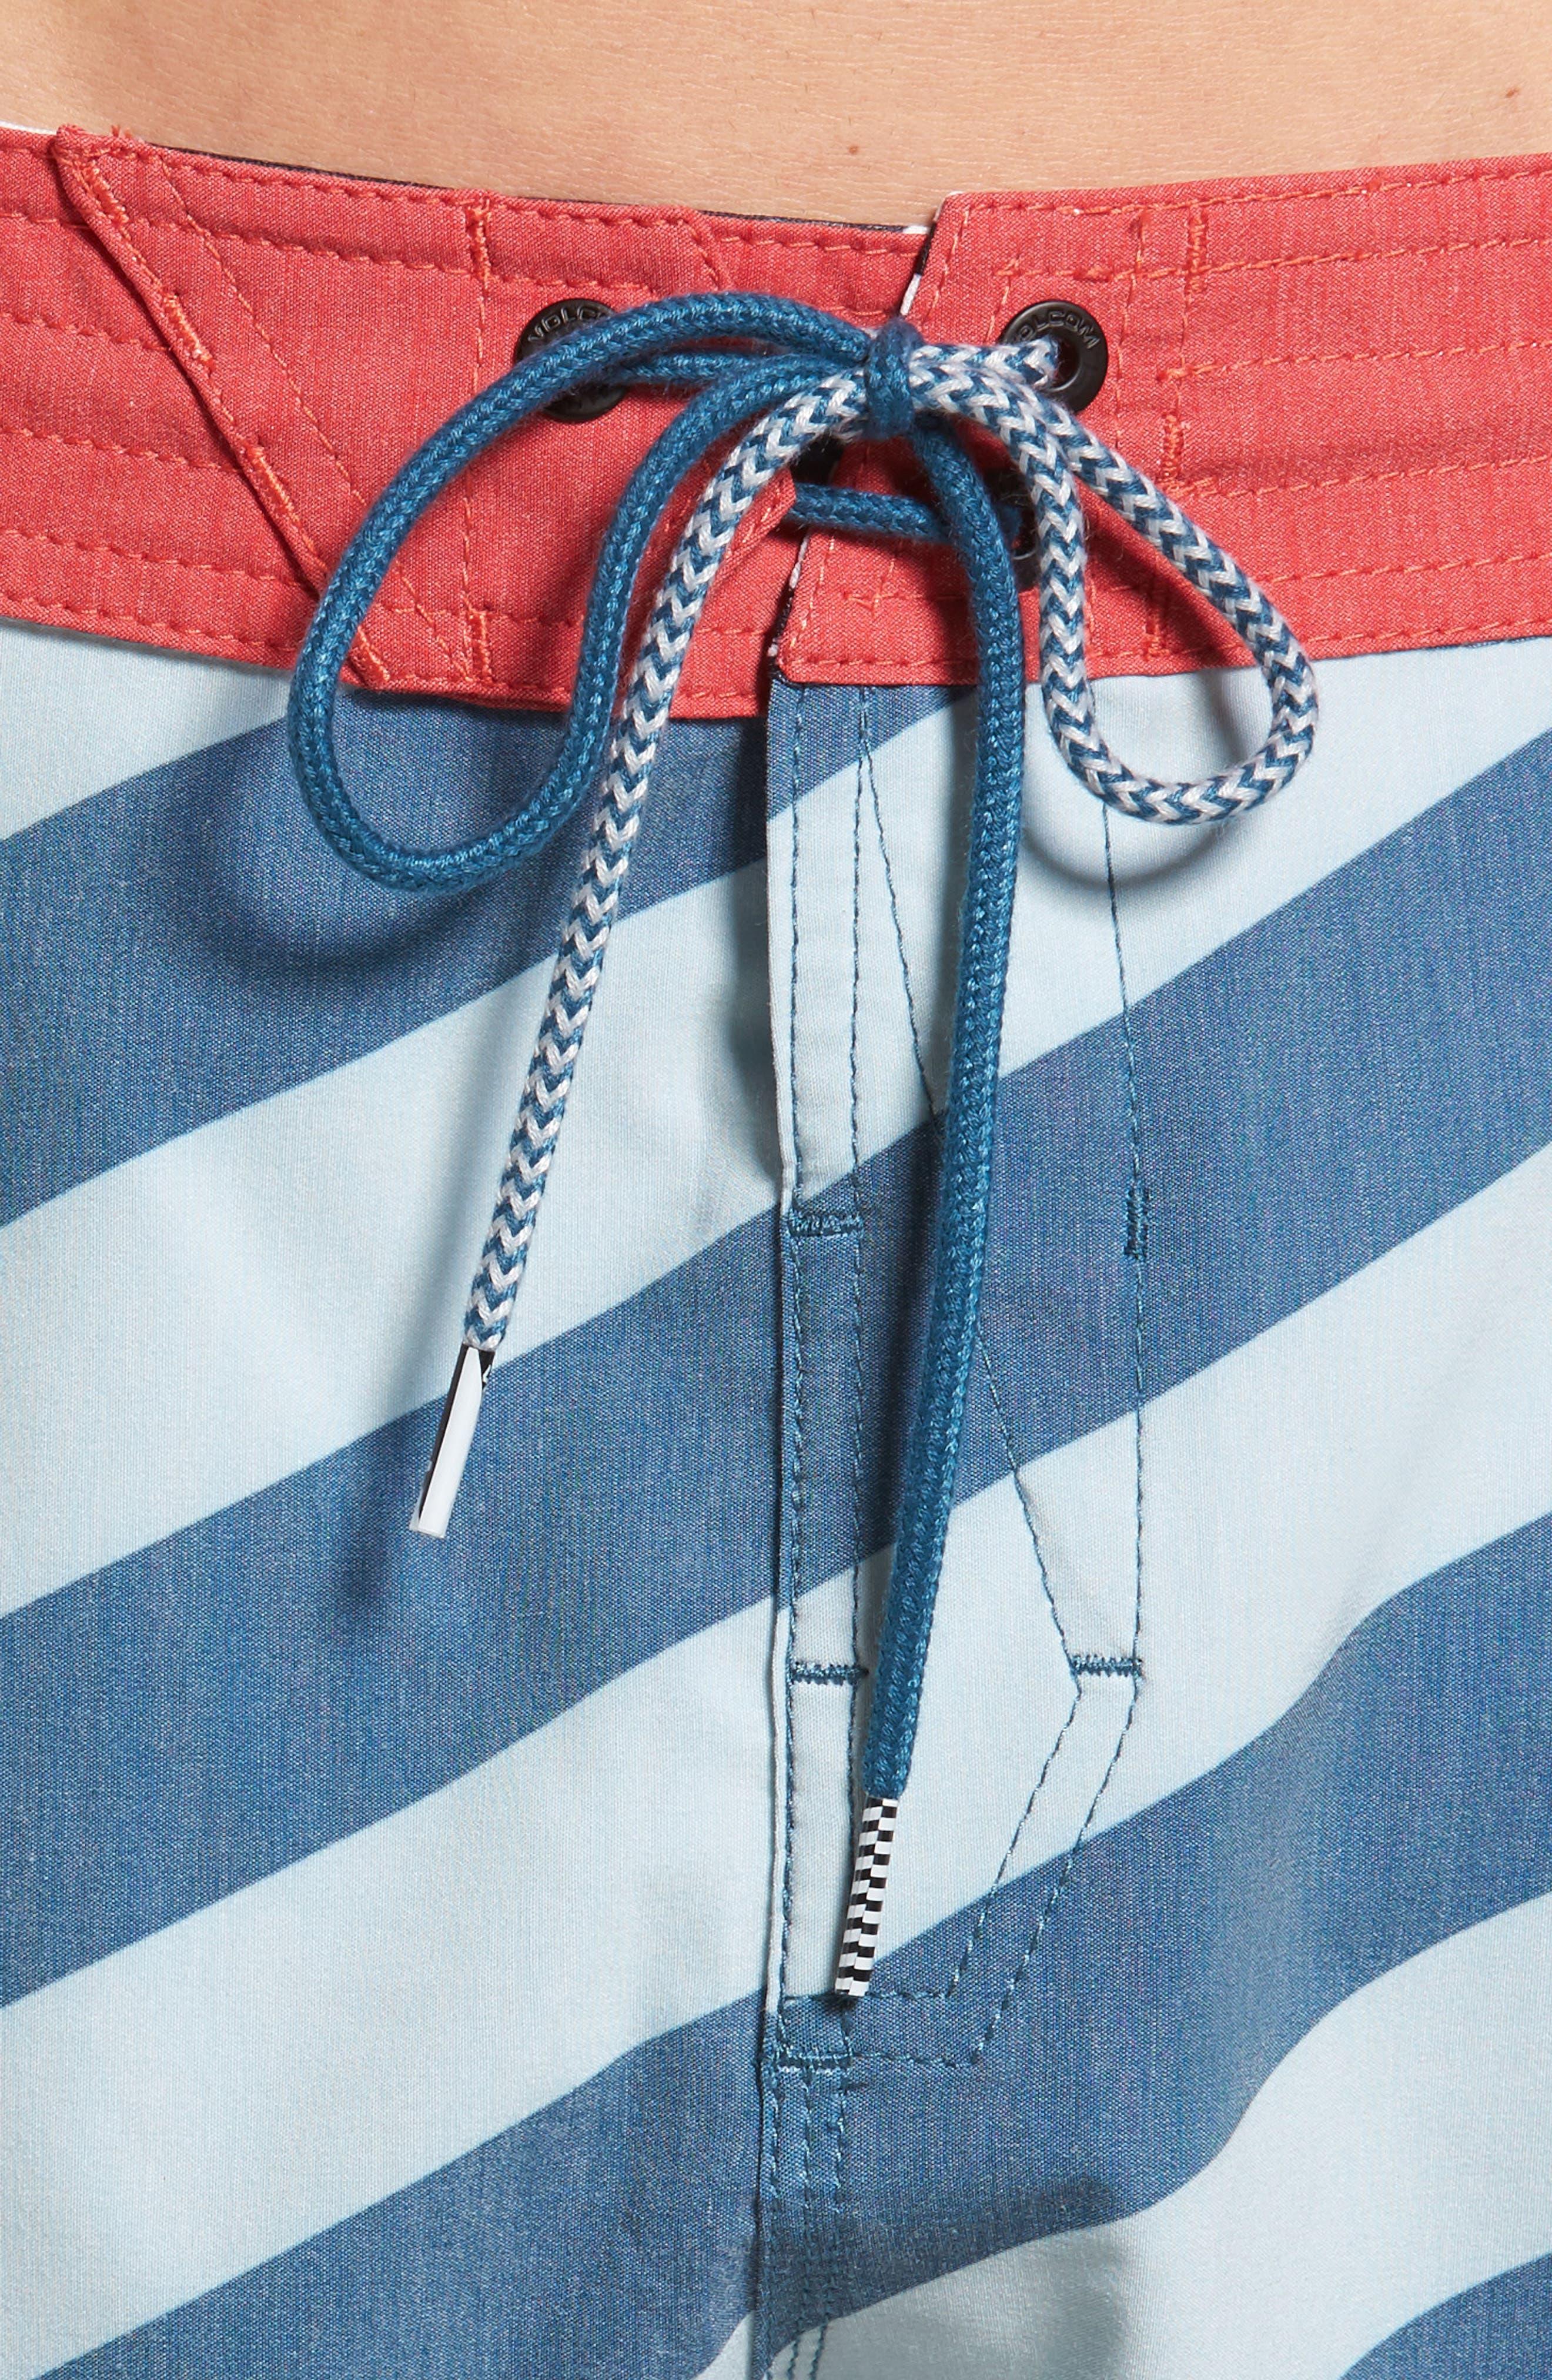 Stripey Slinger Board Shorts,                             Alternate thumbnail 4, color,                             Flight Blue